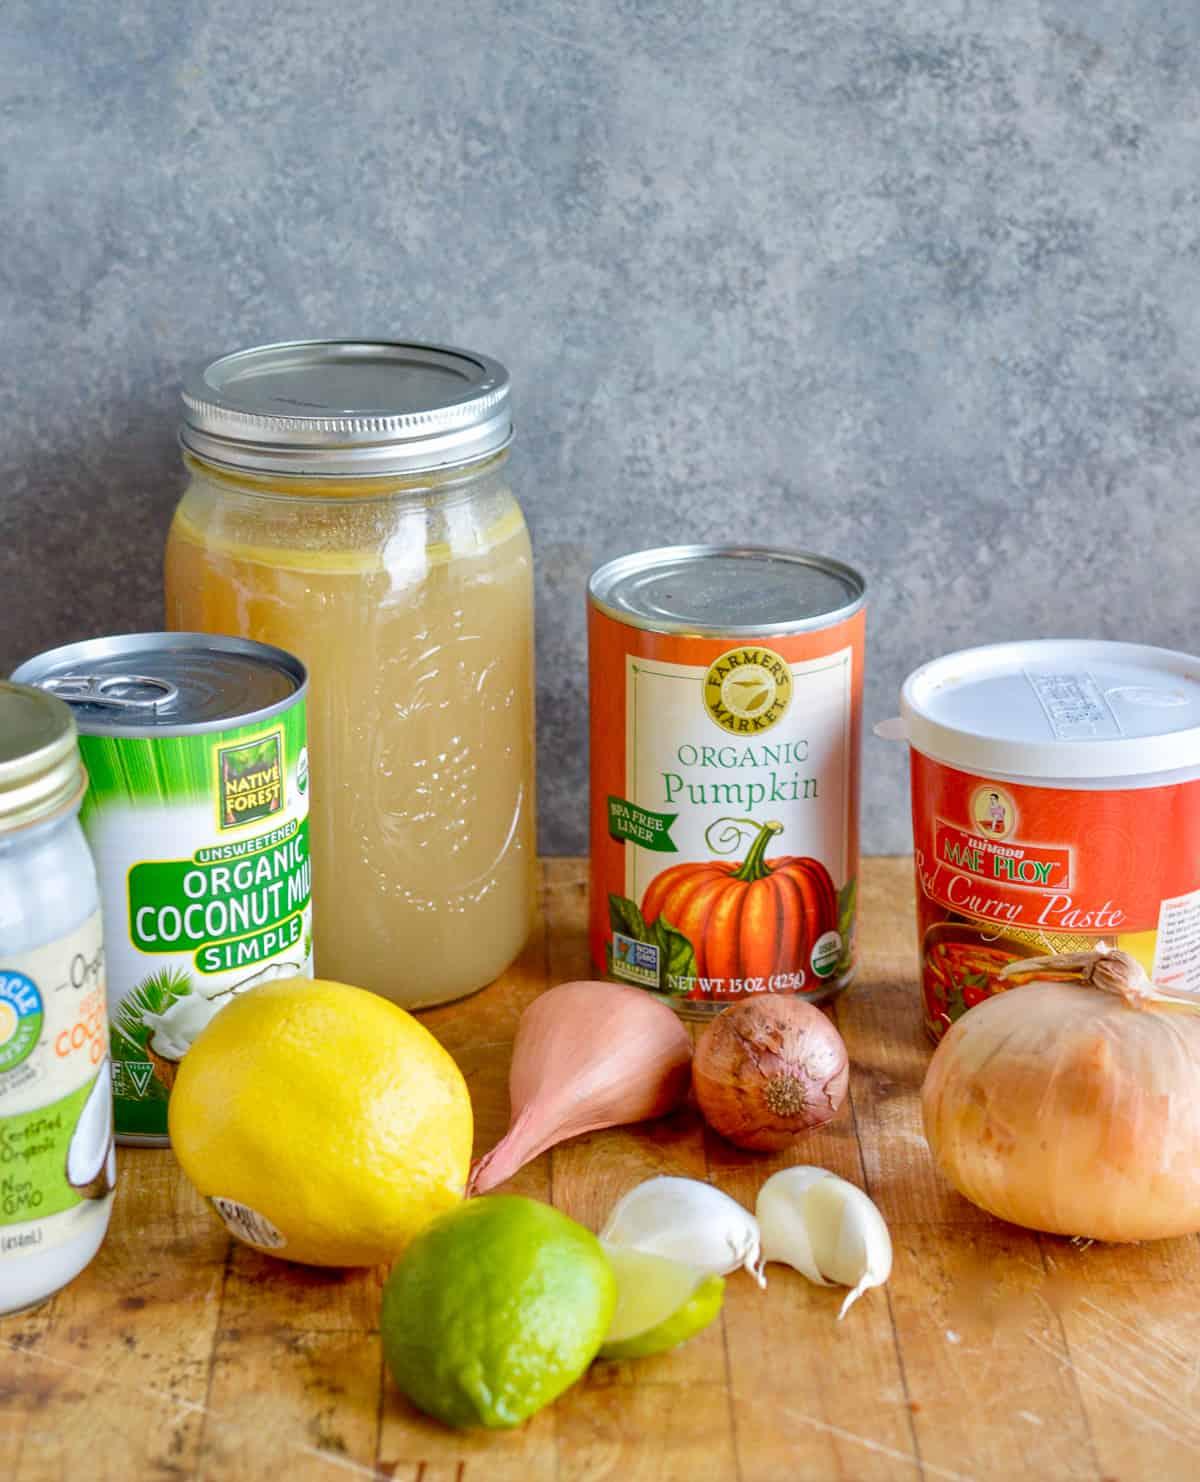 Thai Pumpkin Soup ingredients